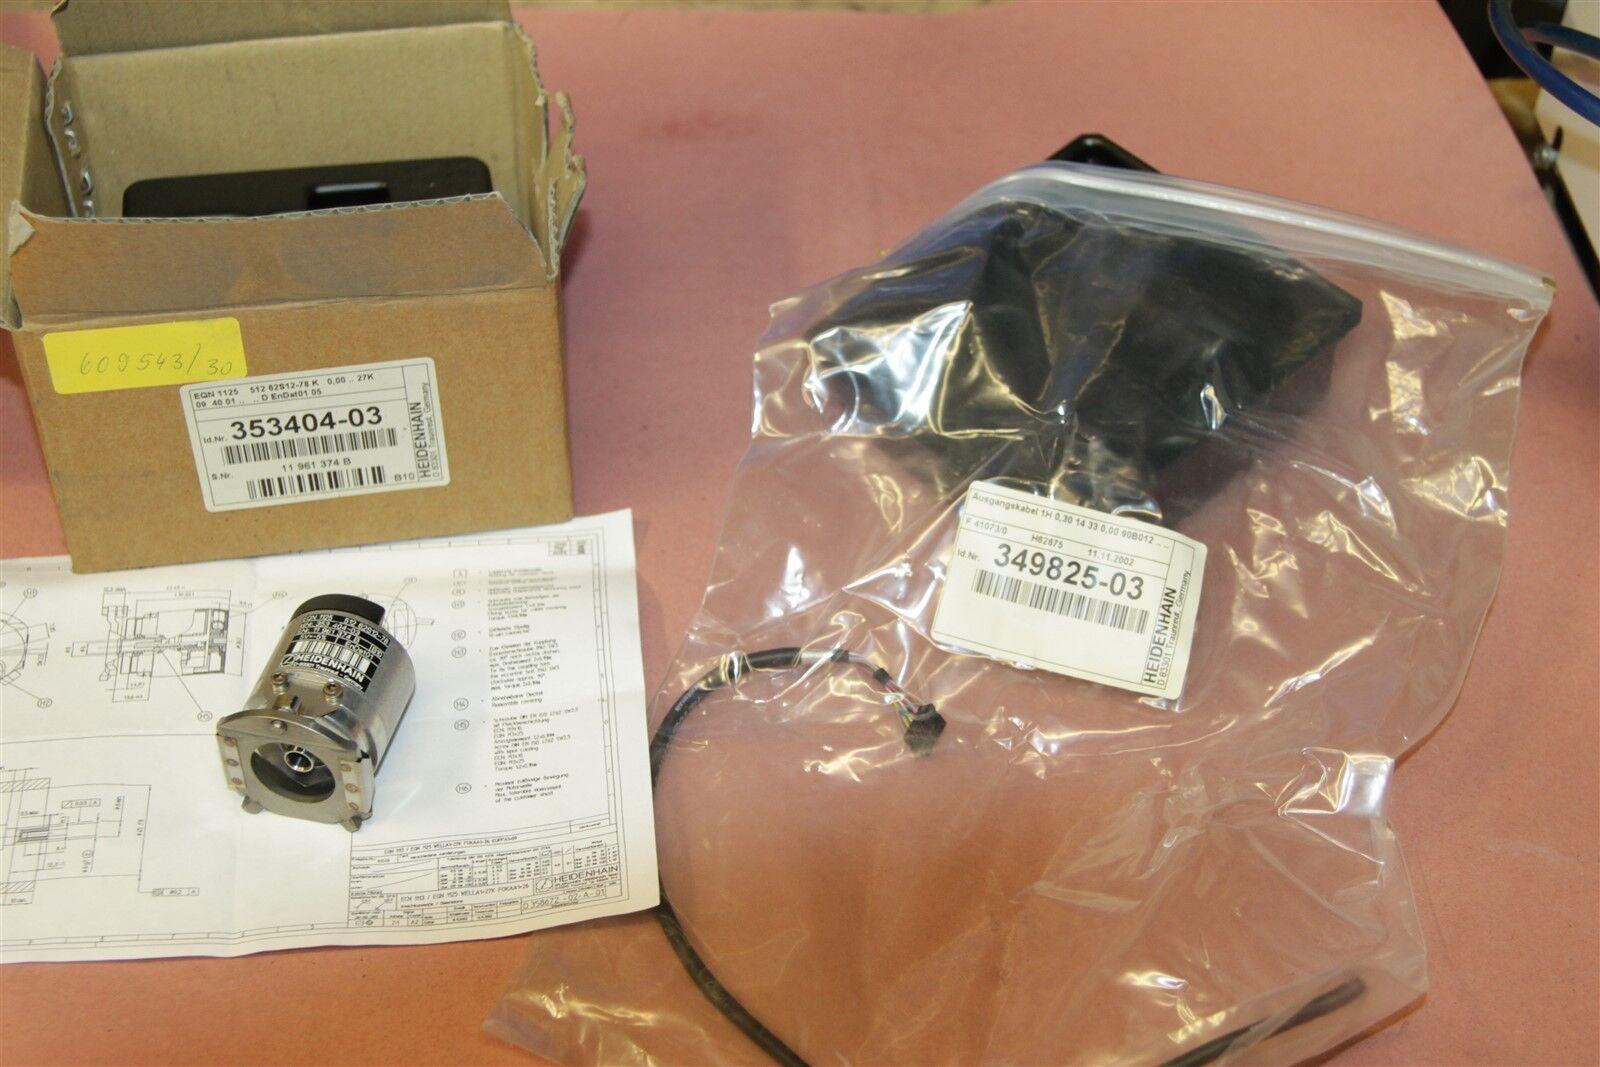 Pleasing Heidenhain 353404 03 Servo Motor Encoder With Wiring Harness 349825 Wiring 101 Photwellnesstrialsorg